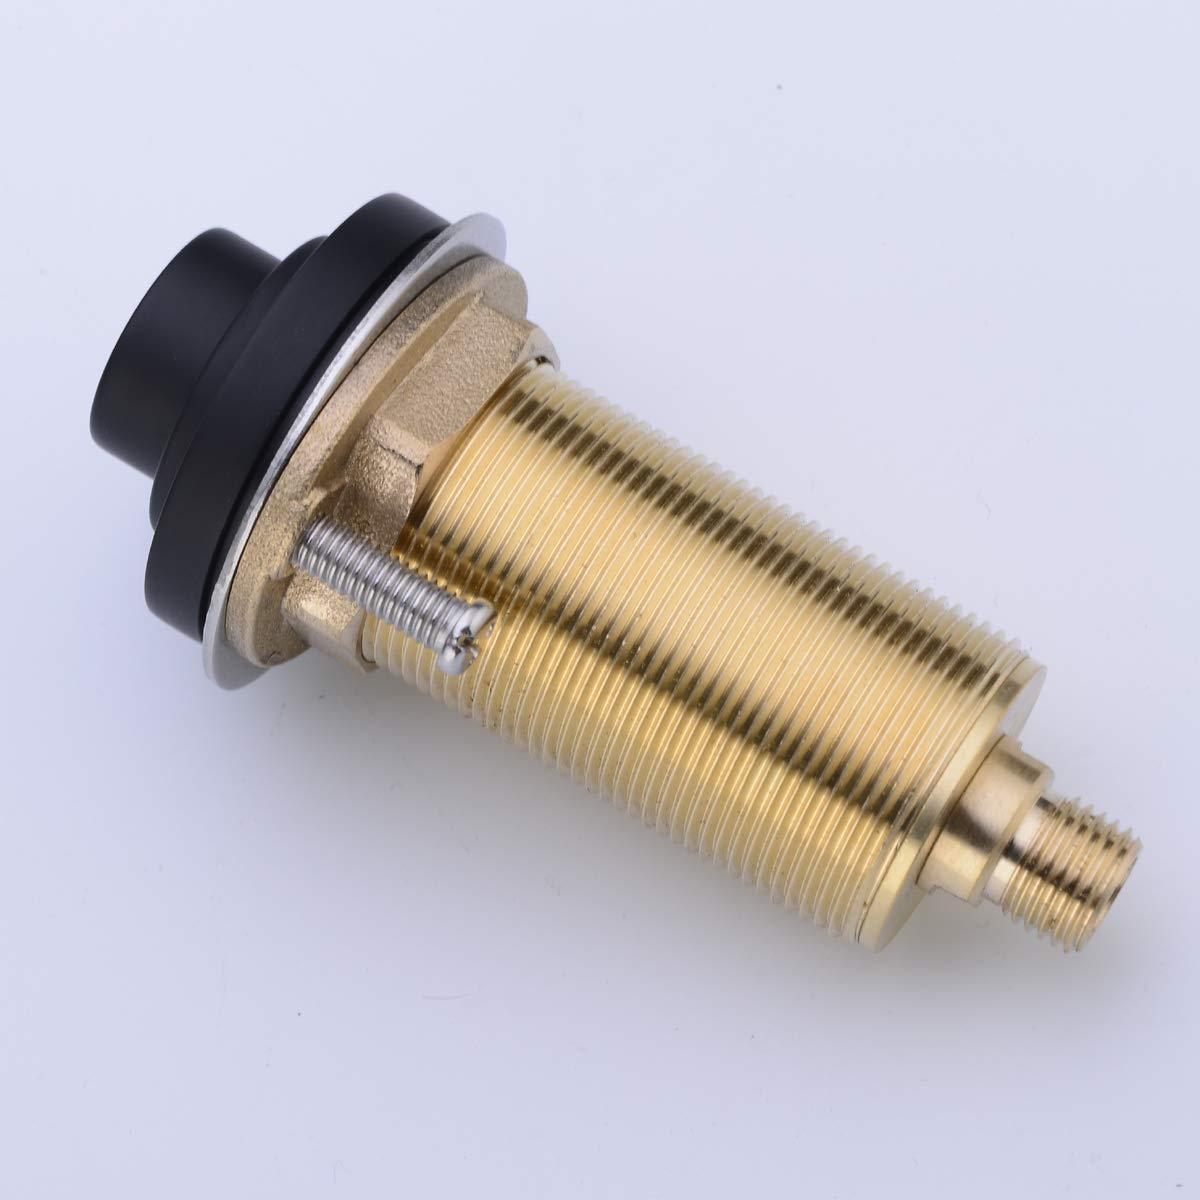 SINKINGDOM SinkTop Air Switch Kit (Full Brass) for Garbage Disposal, Cordless (Matte Black) by SINKINGDOM (Image #3)